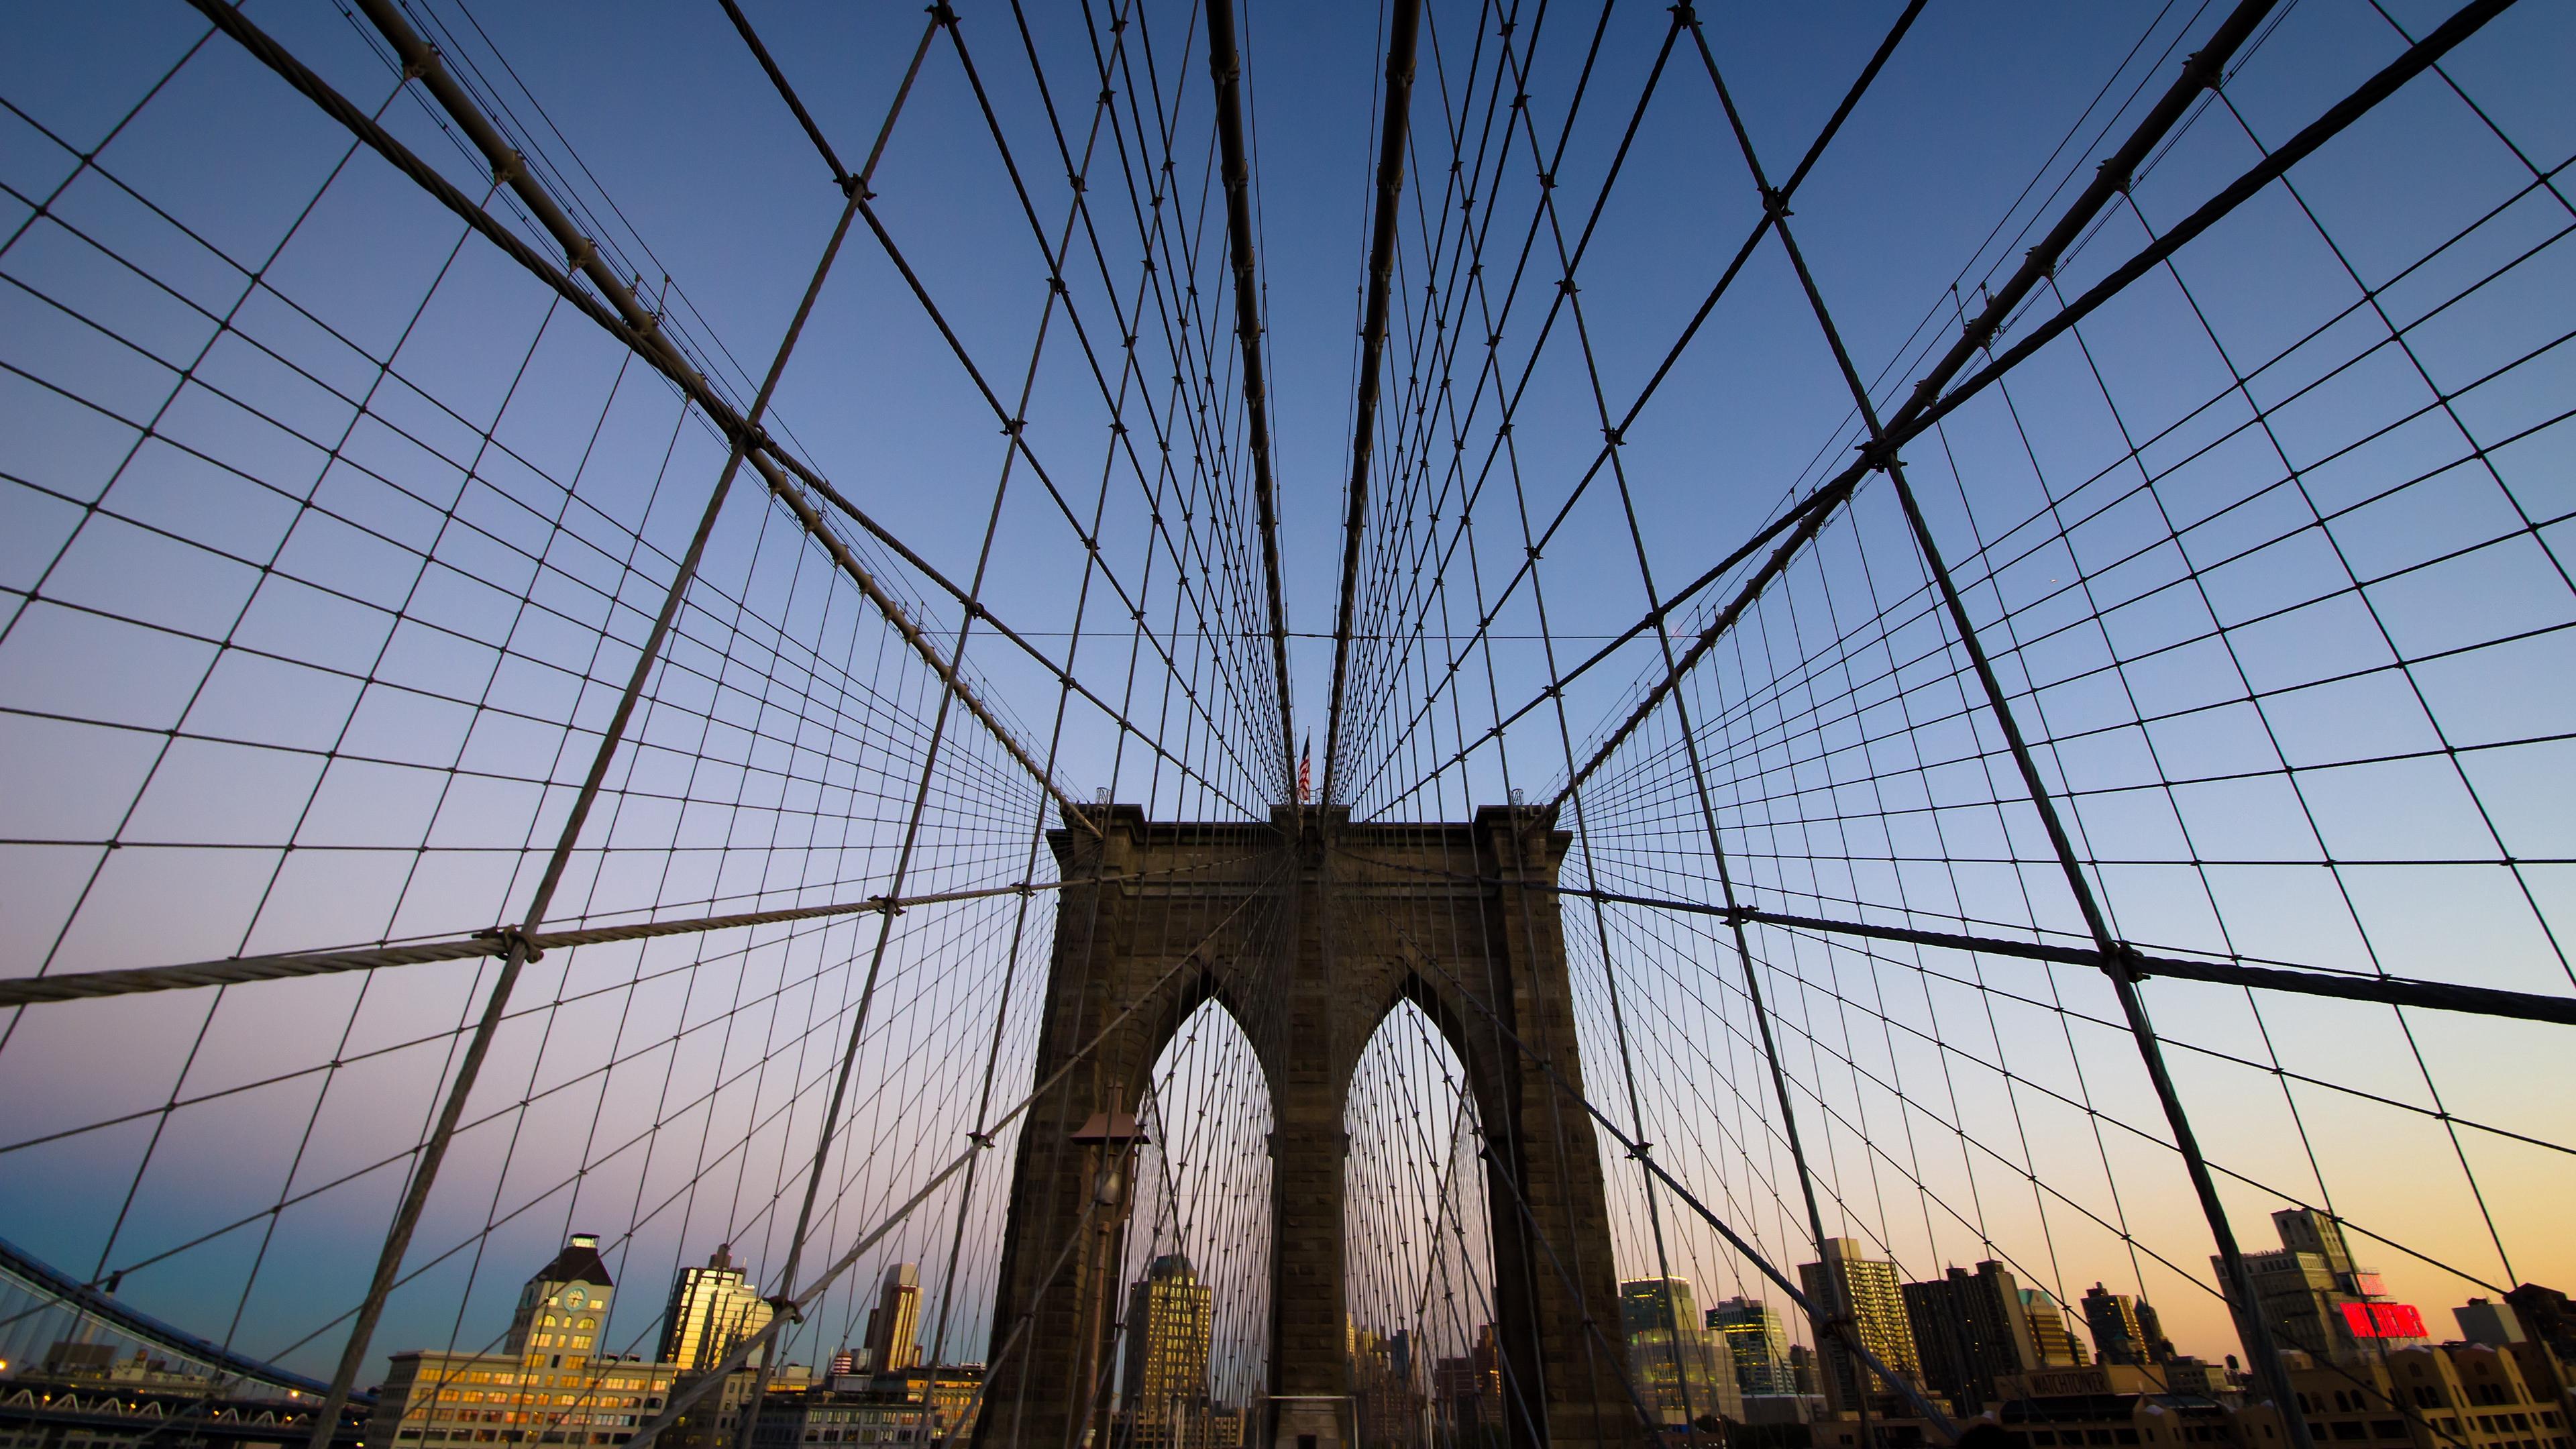 brooklyn bridge new york evening 4k 1538065249 - brooklyn bridge, new york, evening 4k - new york, Evening, brooklyn bridge